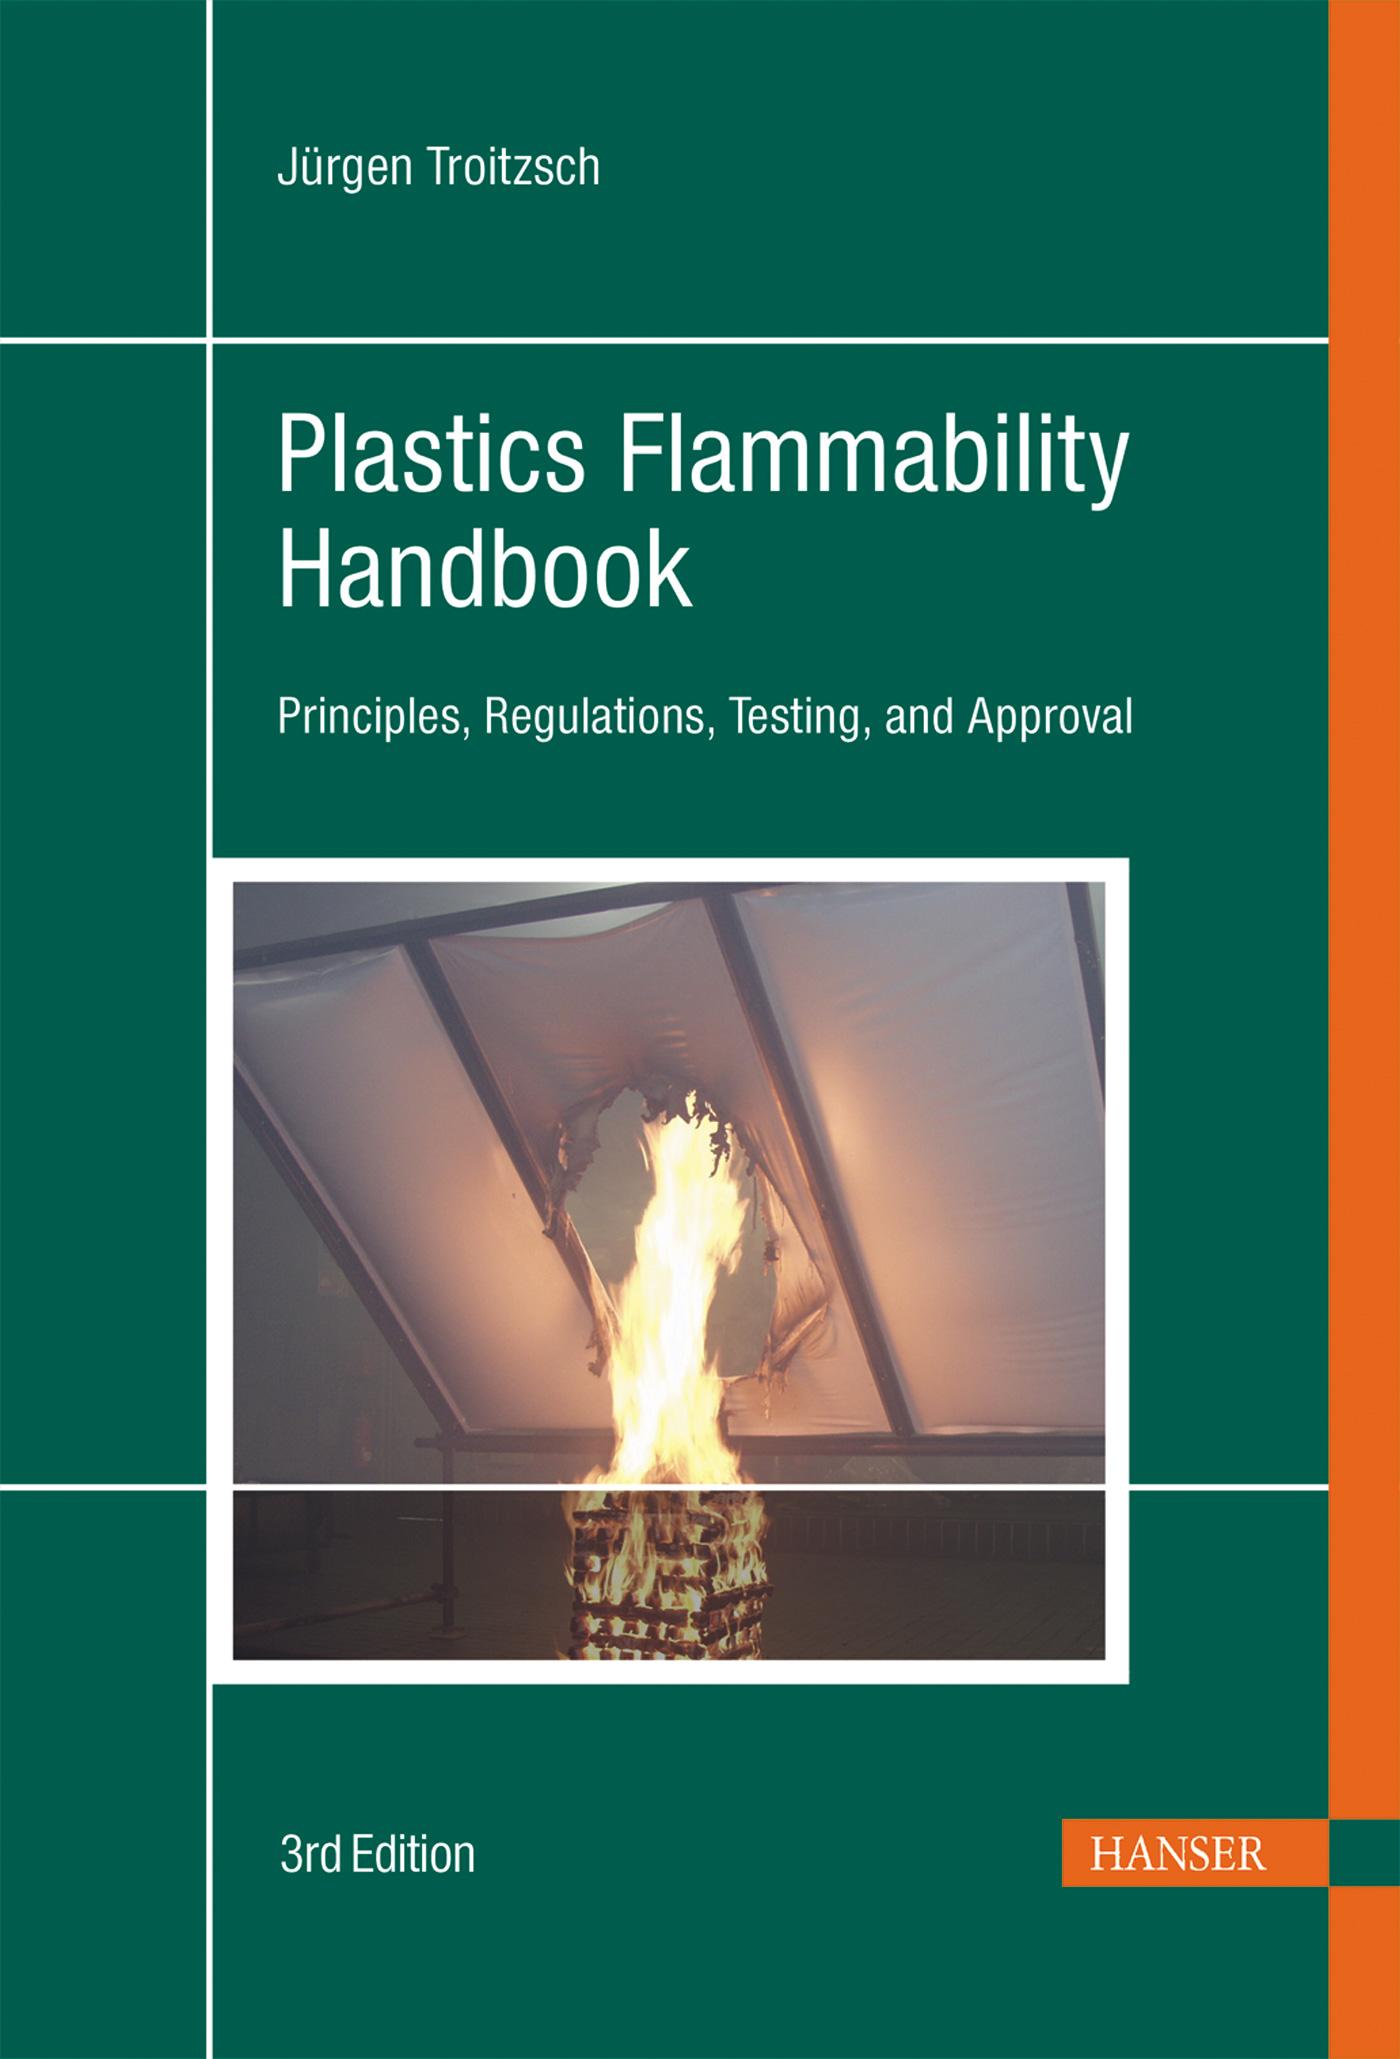 Plastics Flammability Handbook, 978-3-446-21308-1